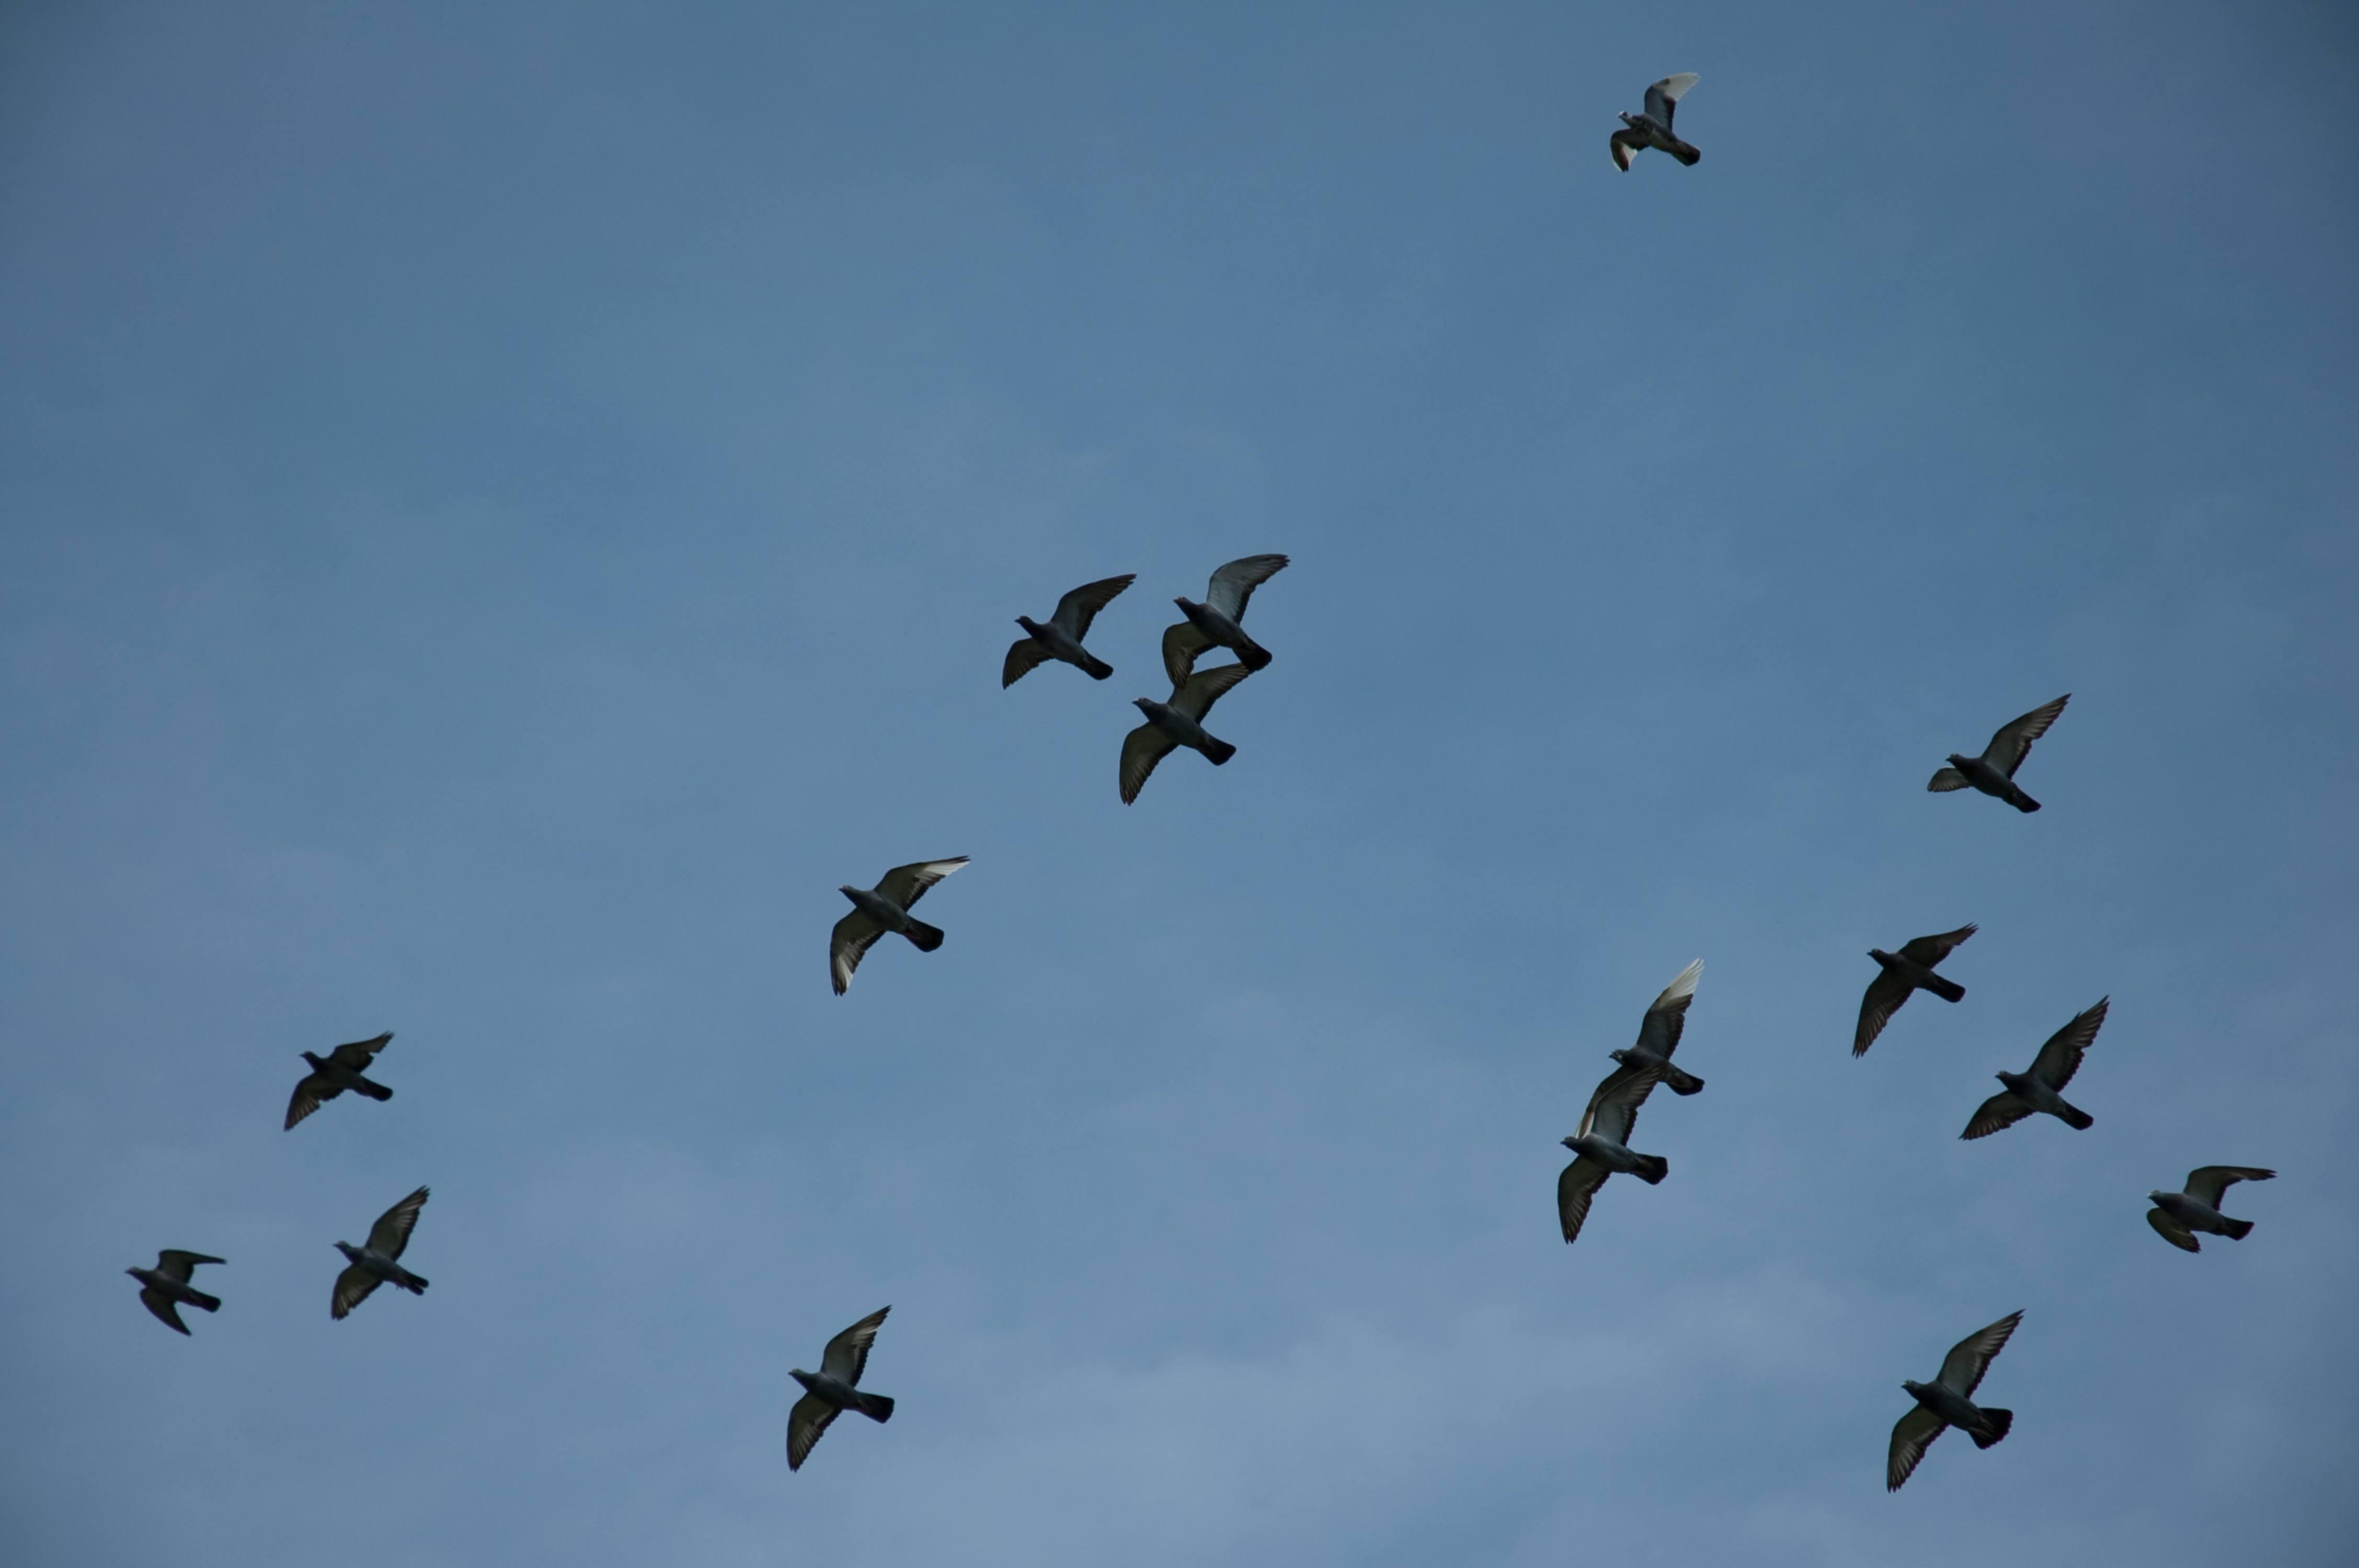 Flock of Birds on a Blue Sky